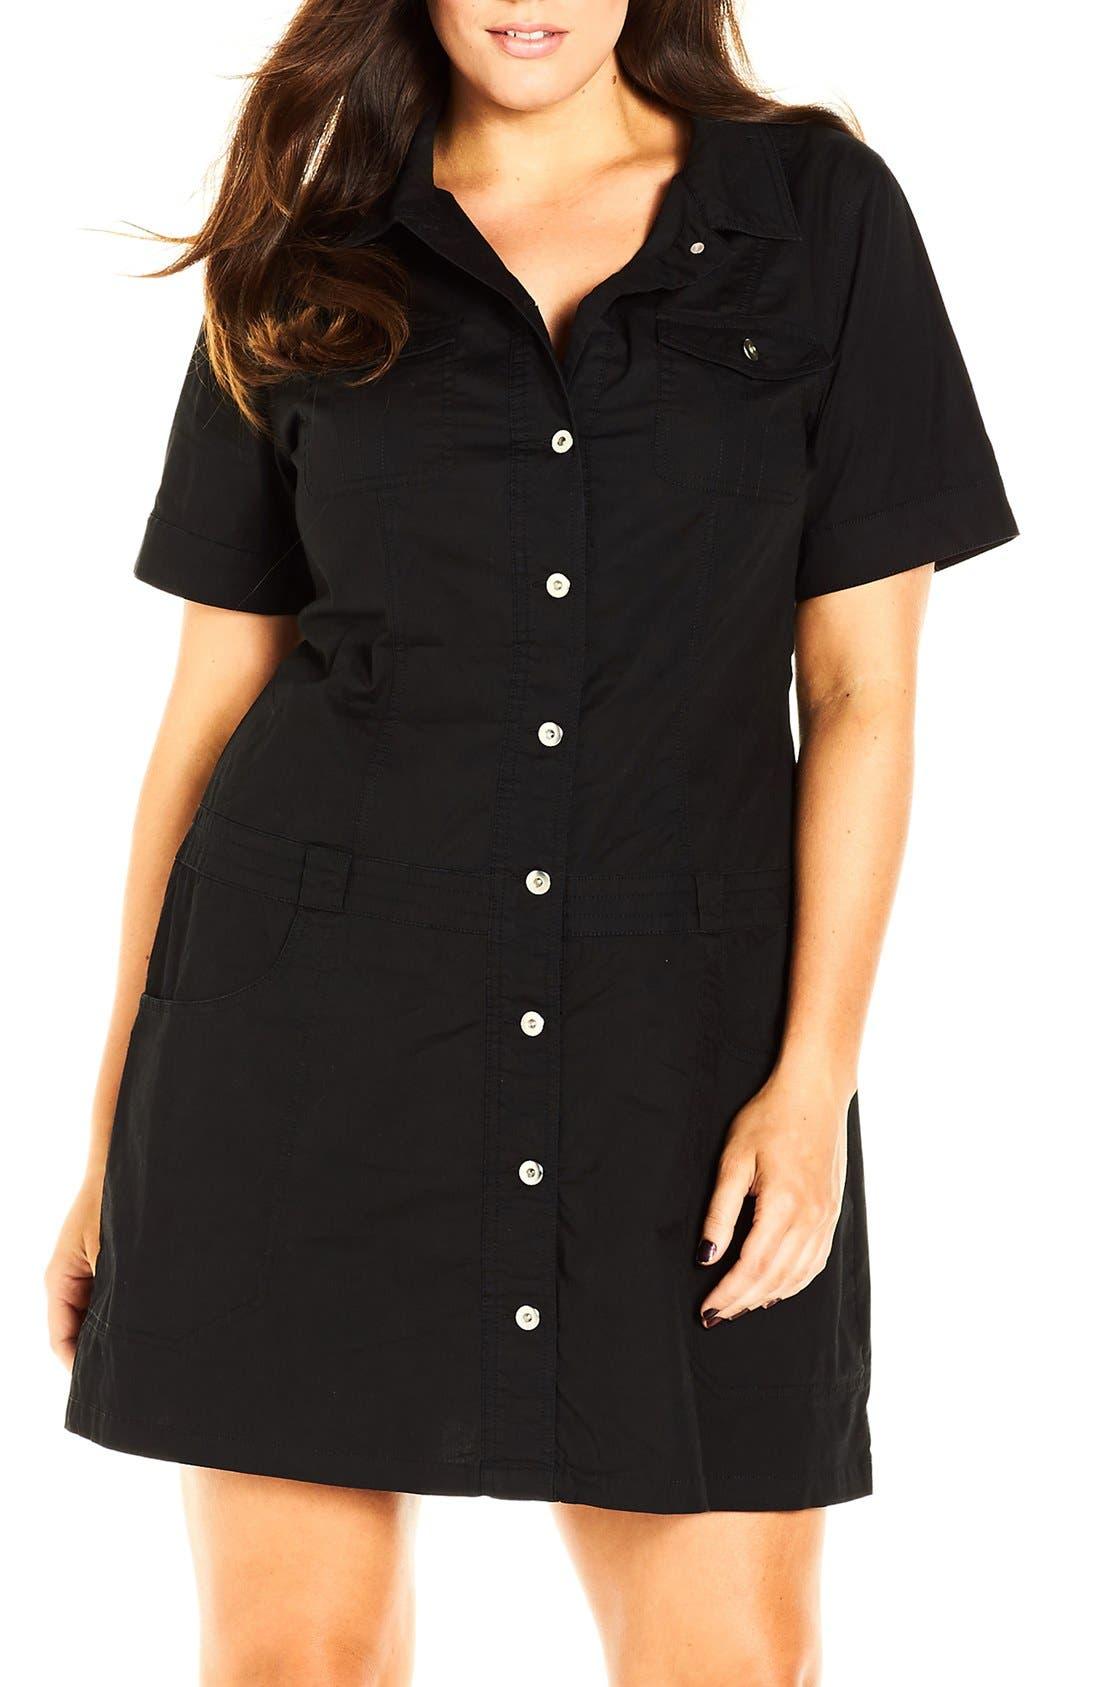 'Adventure' Short Sleeve Stretch Cotton Shirtdress,                             Main thumbnail 1, color,                             001